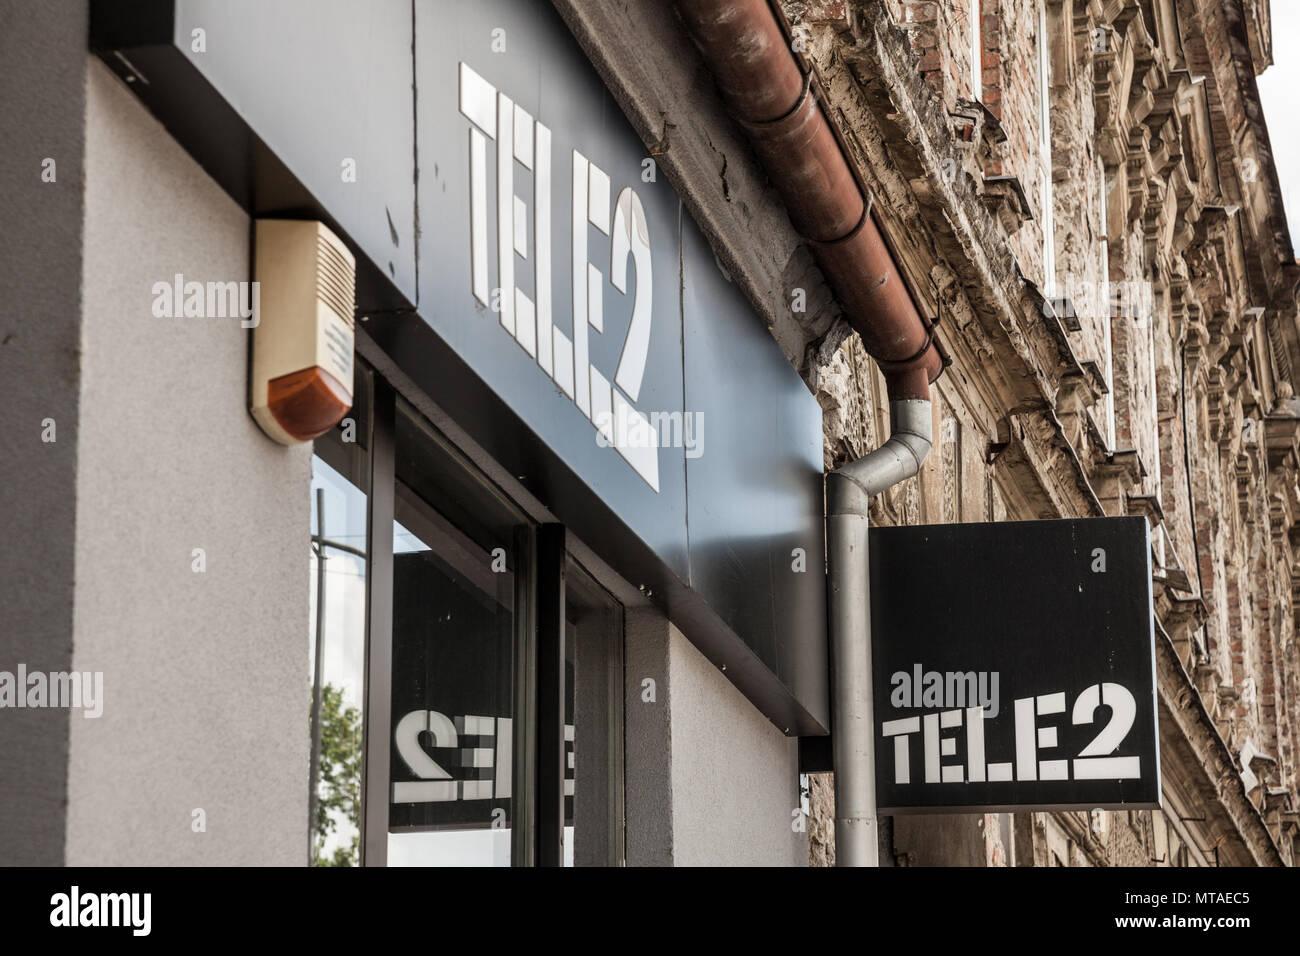 OSIJEK, CROATIA - MAY 12, 2018: Logo of Tele2 sign on their local shop in Osijek. Tele 2 is a European telecommunications operator from Sweden providi - Stock Image